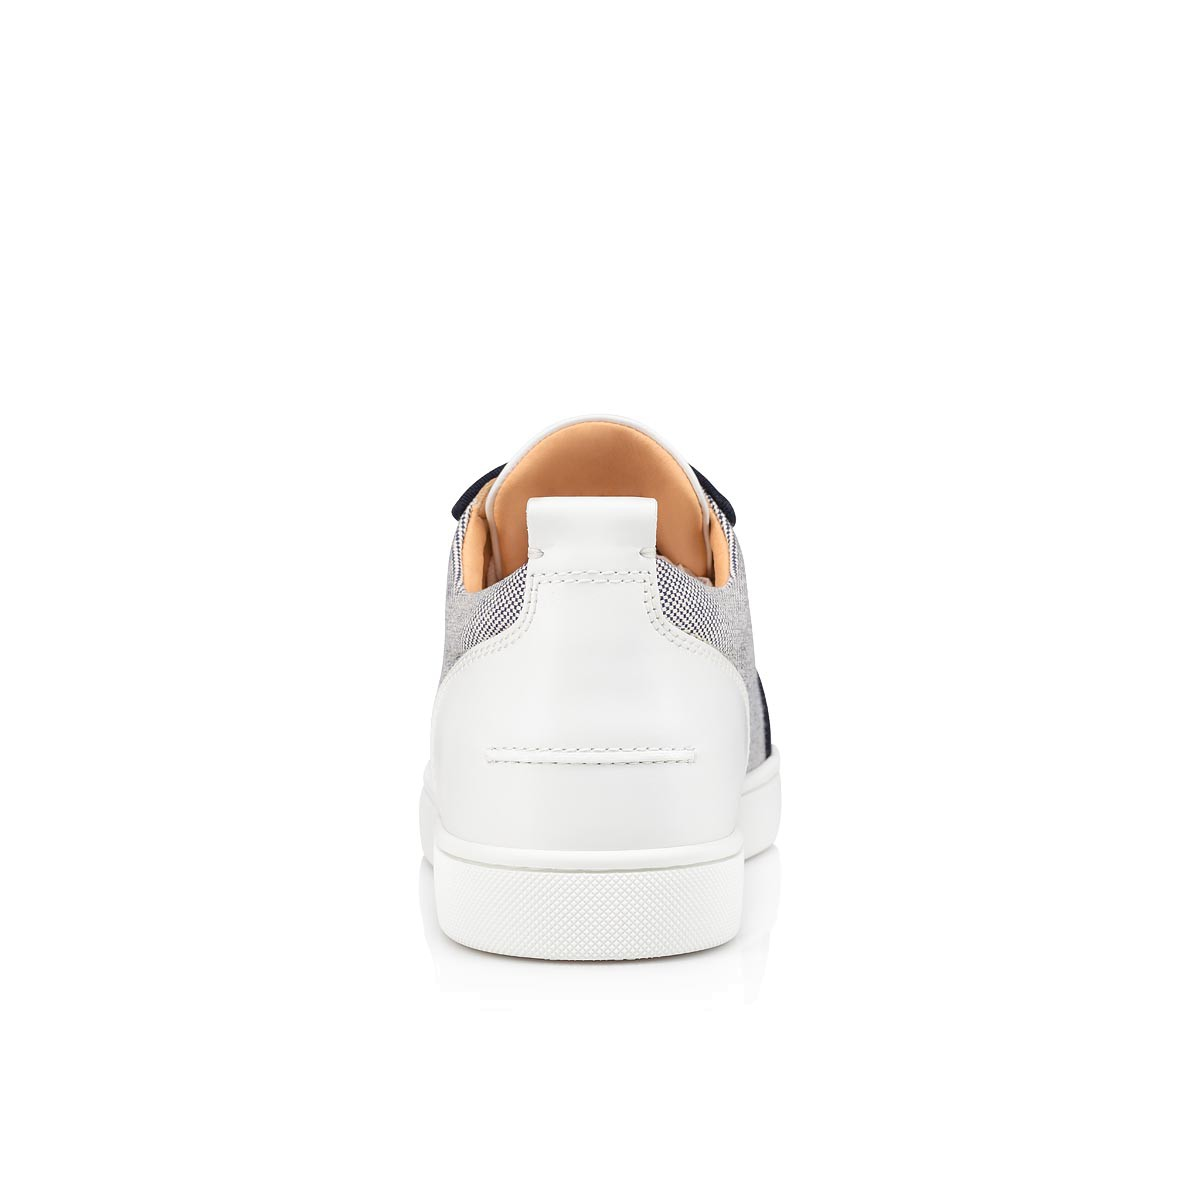 Shoes - Rantulow Flat - Christian Louboutin